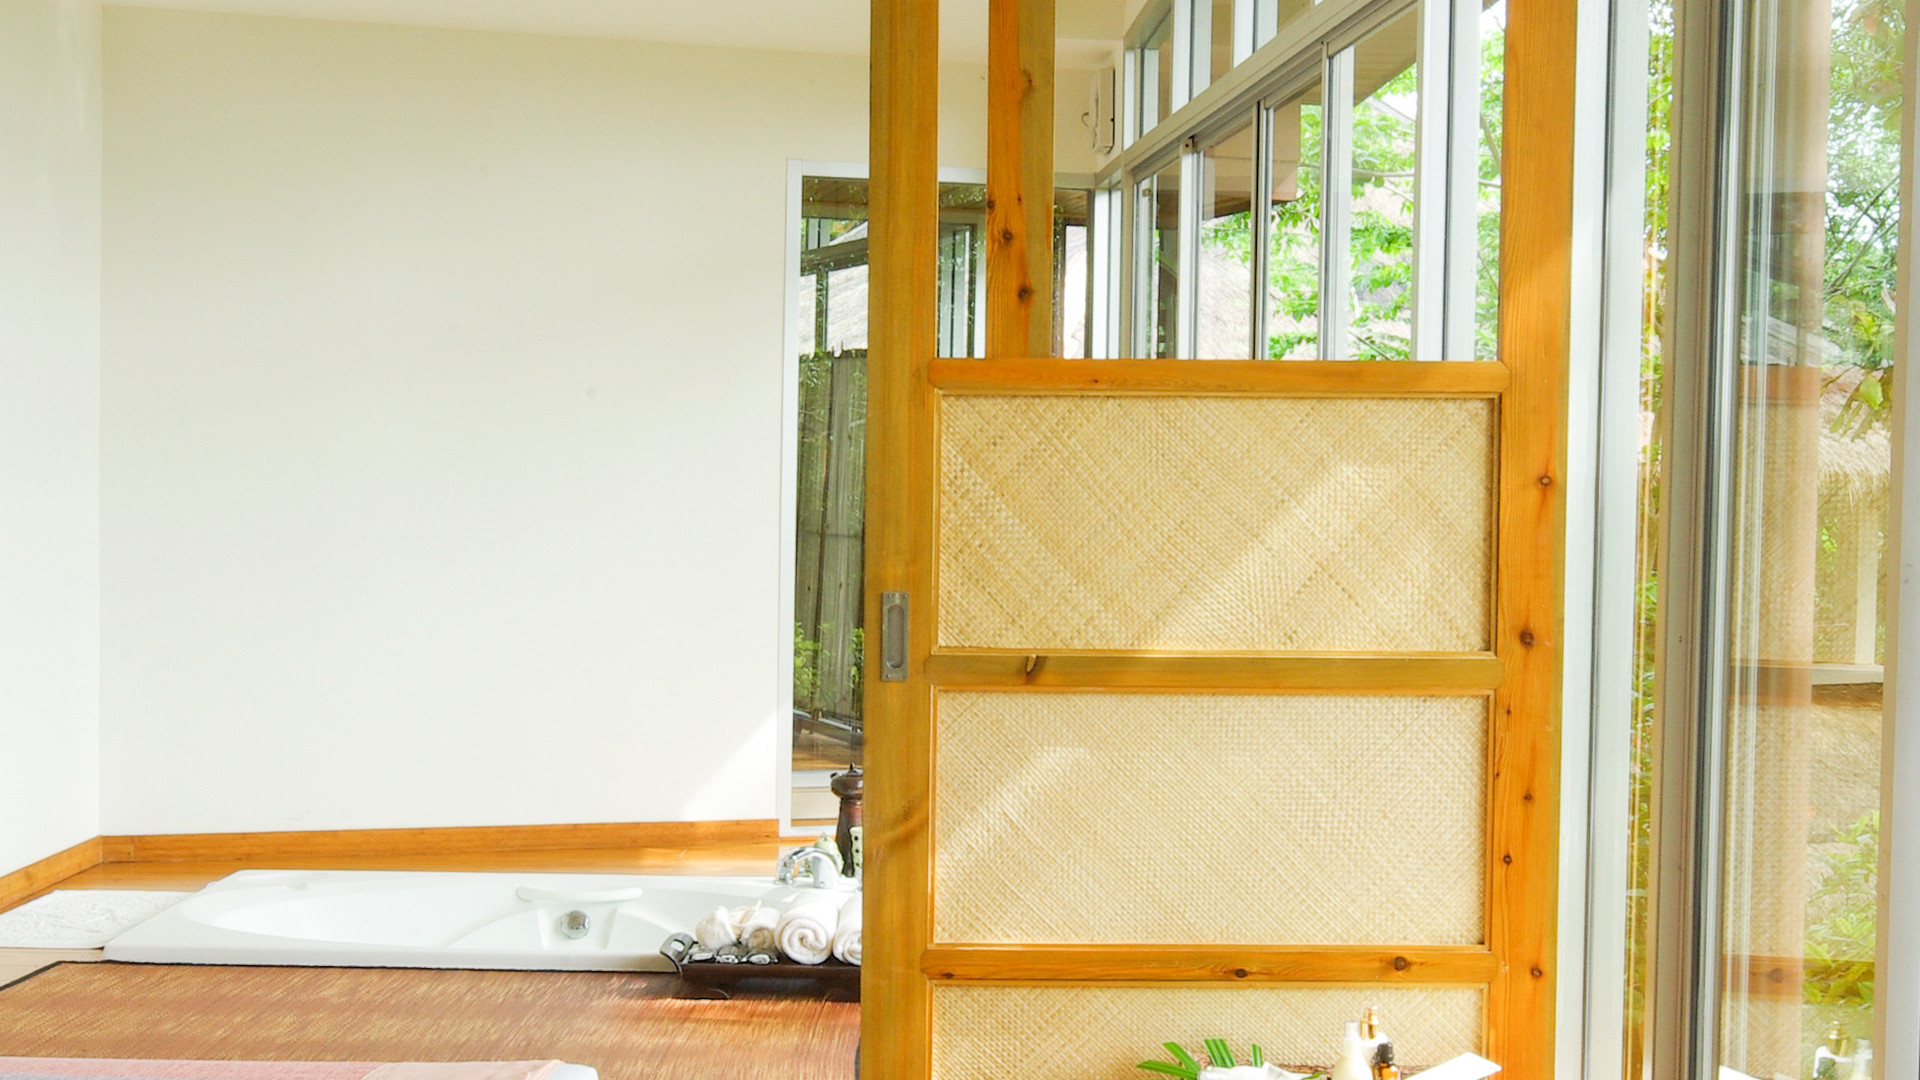 spa-open-nature-room_HDGgTOkdhfx.jpg